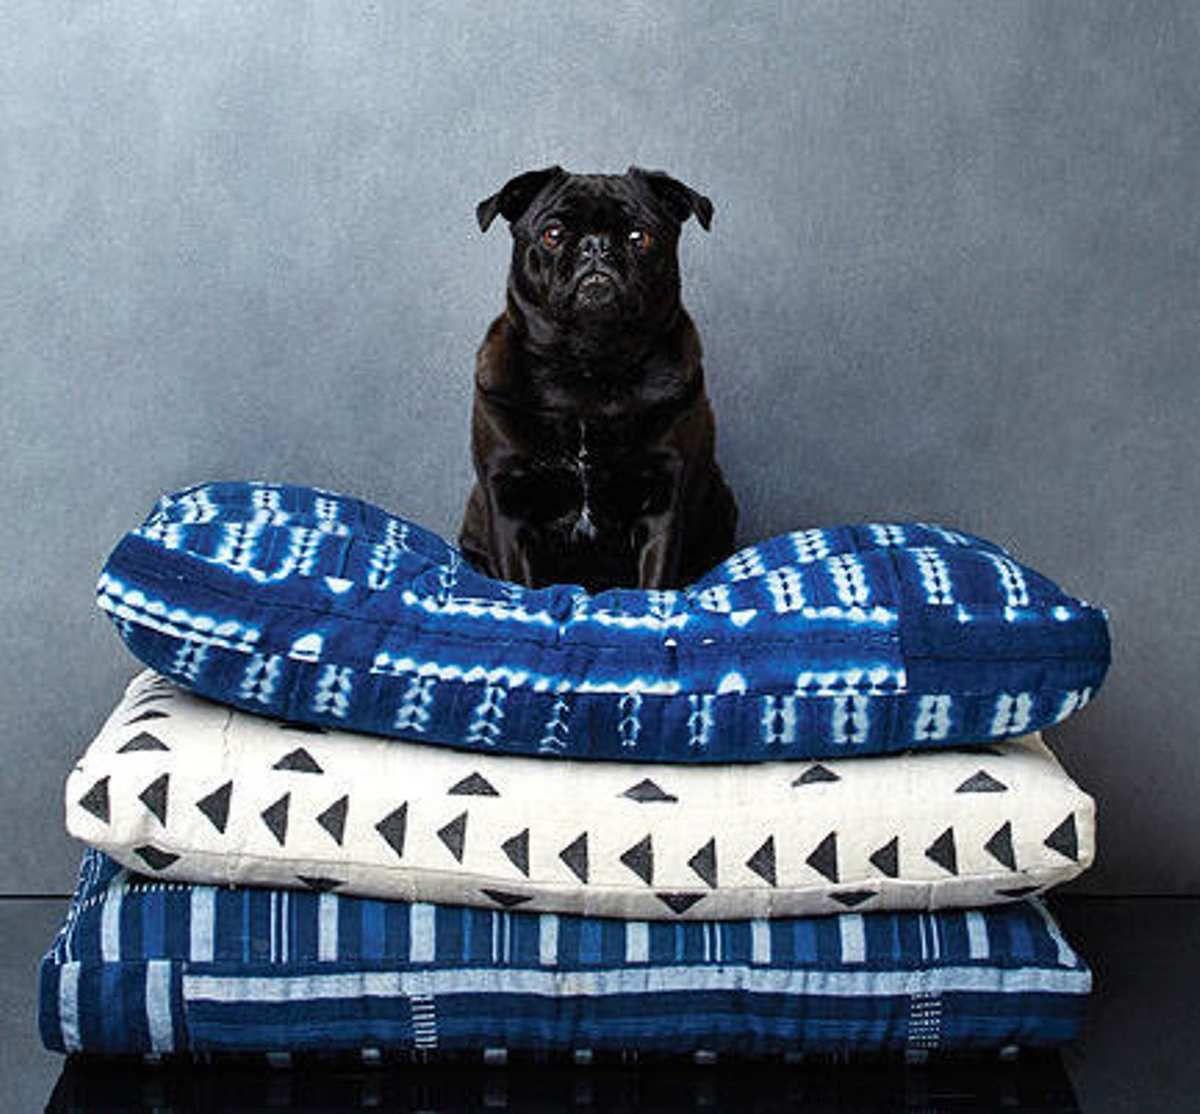 The Best Dog Beds, According to Dog Experts Custom dog